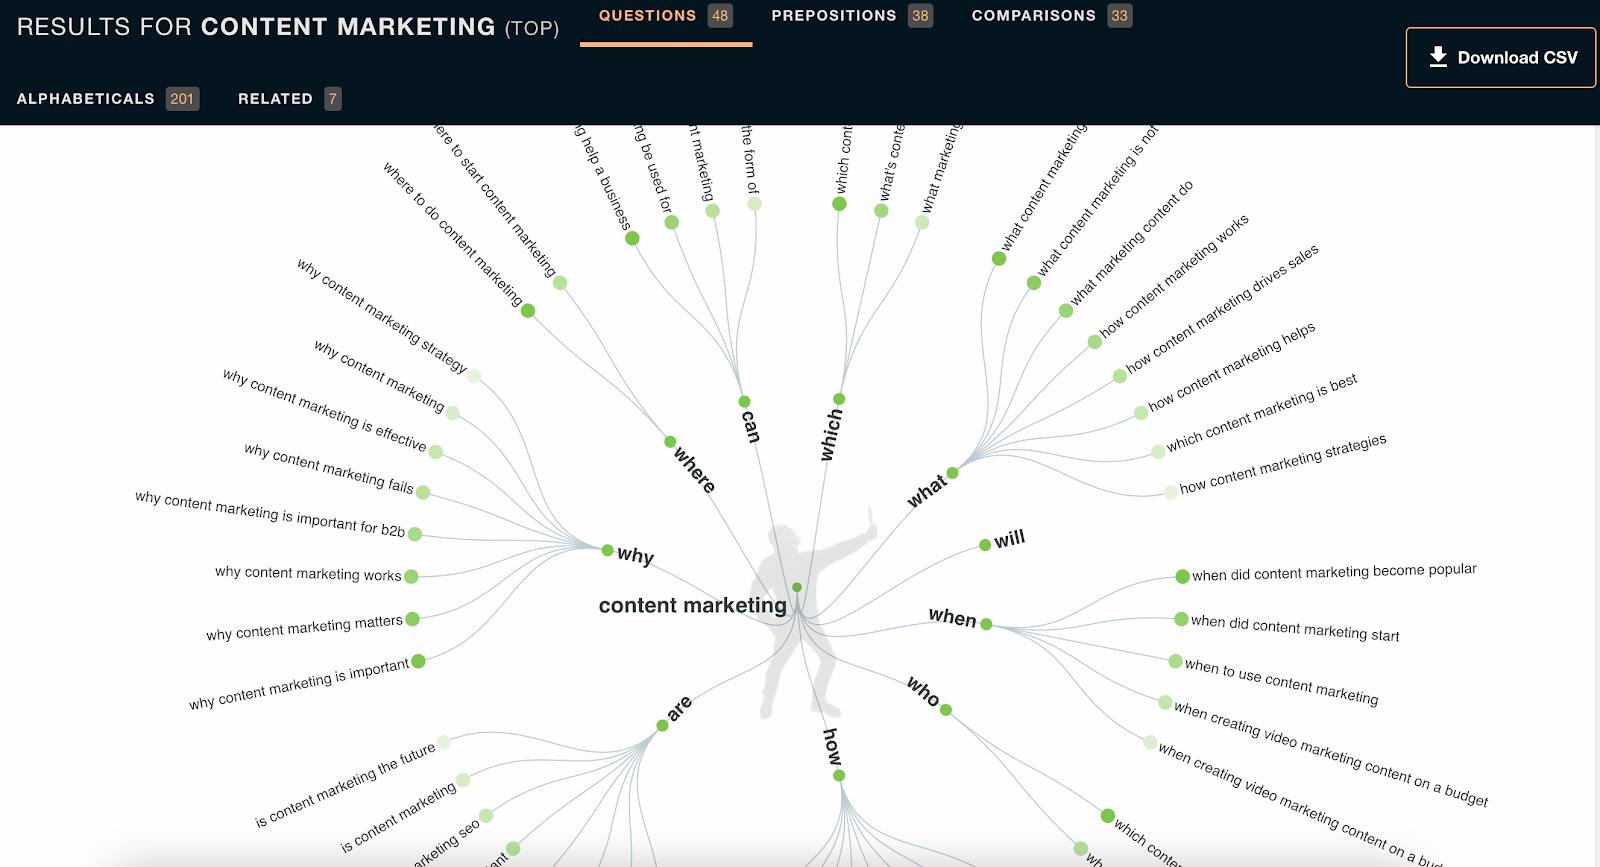 omniscient digital best content marketing tools answer the public